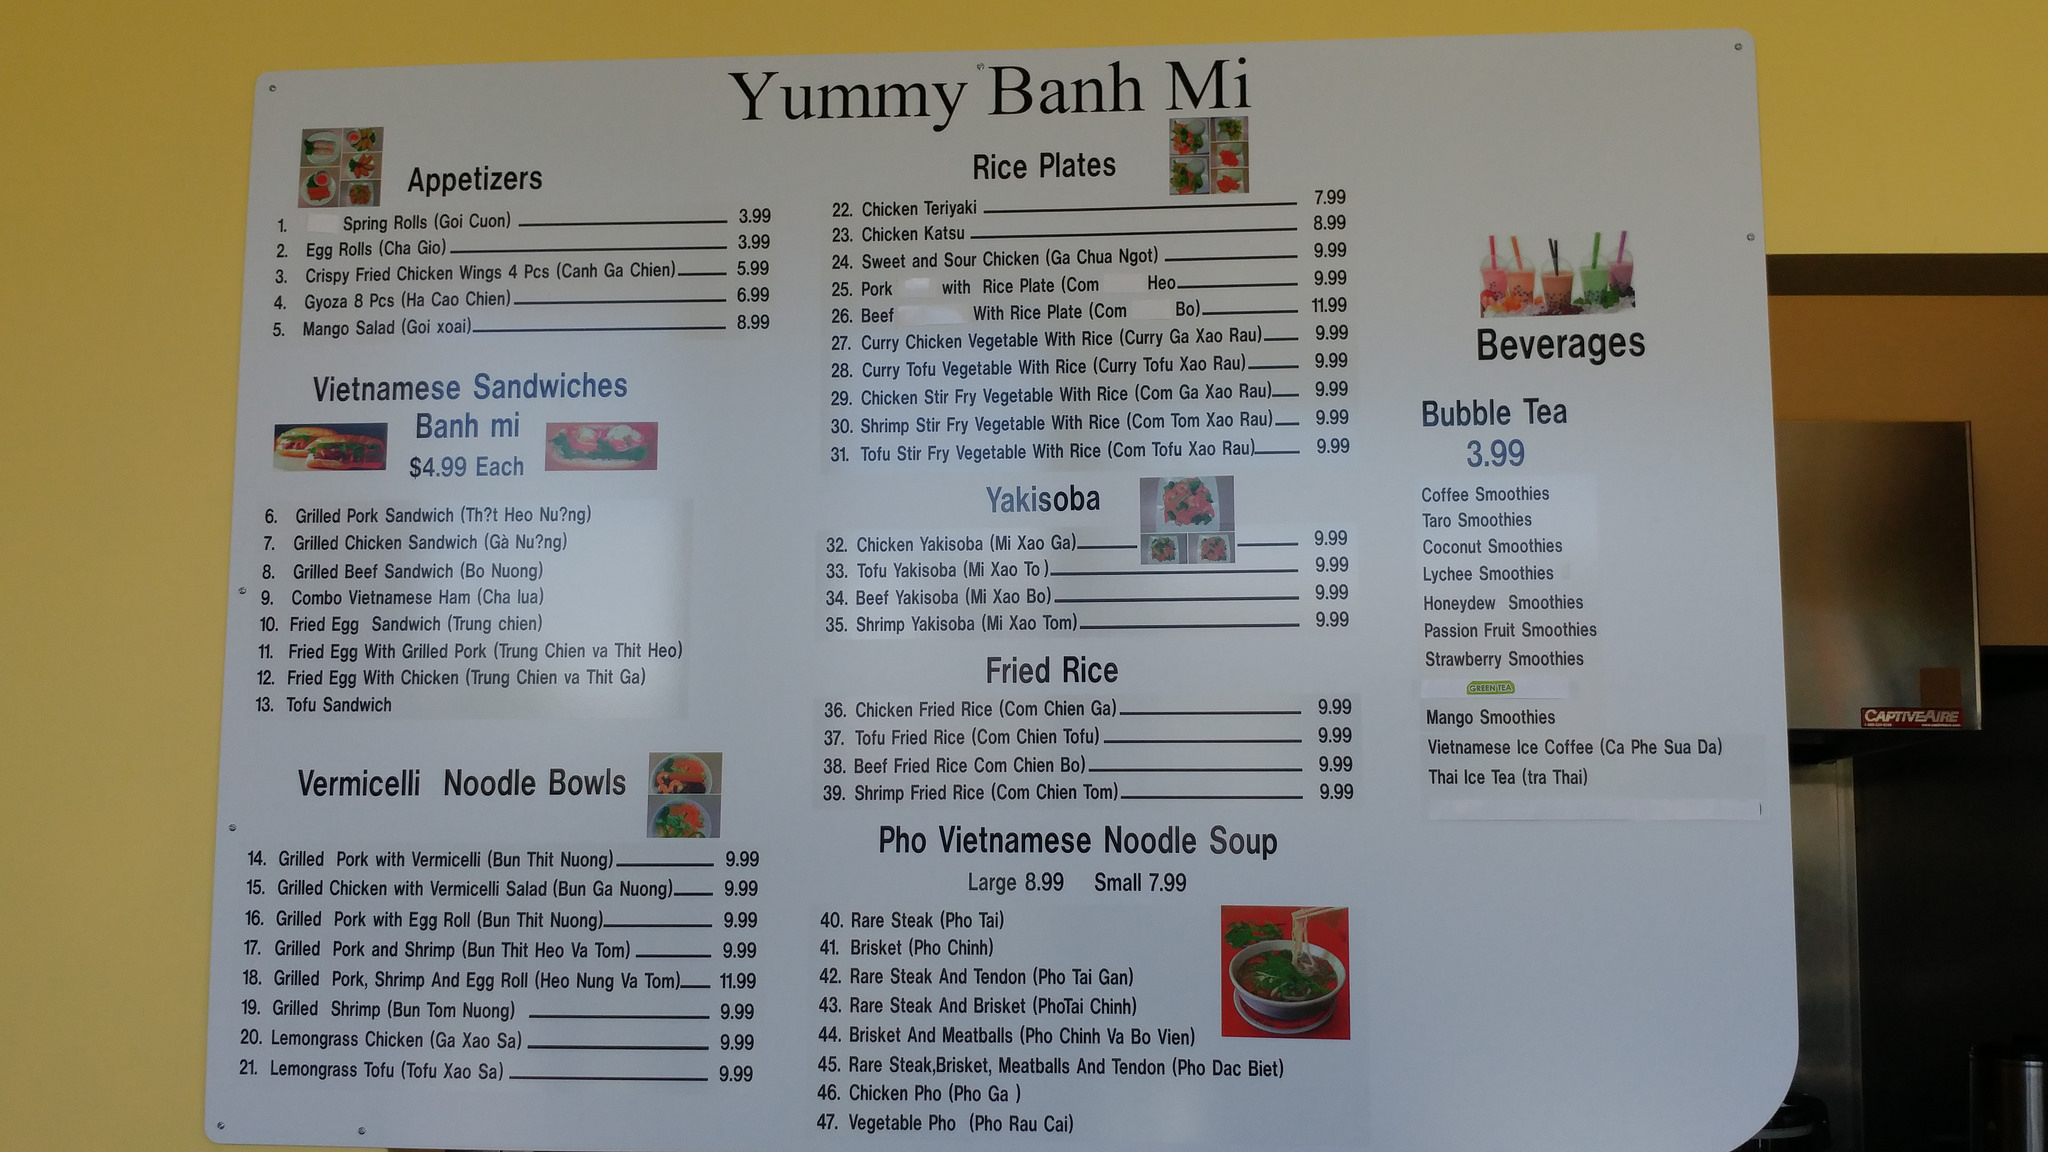 Yummy Banh Mi's surprisingly large menu